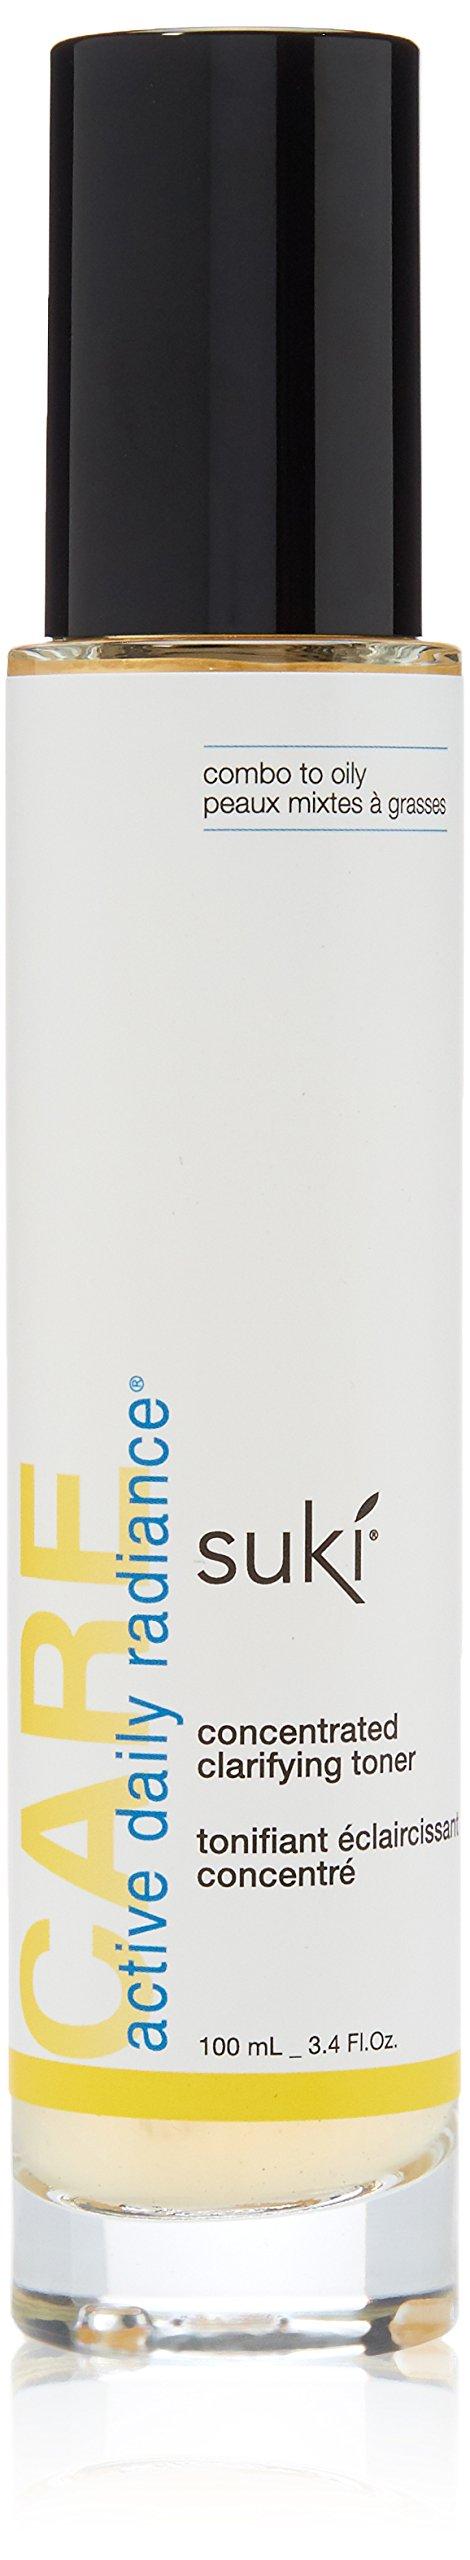 Suki Concentrated Clarifying Toner 3.4 fl oz